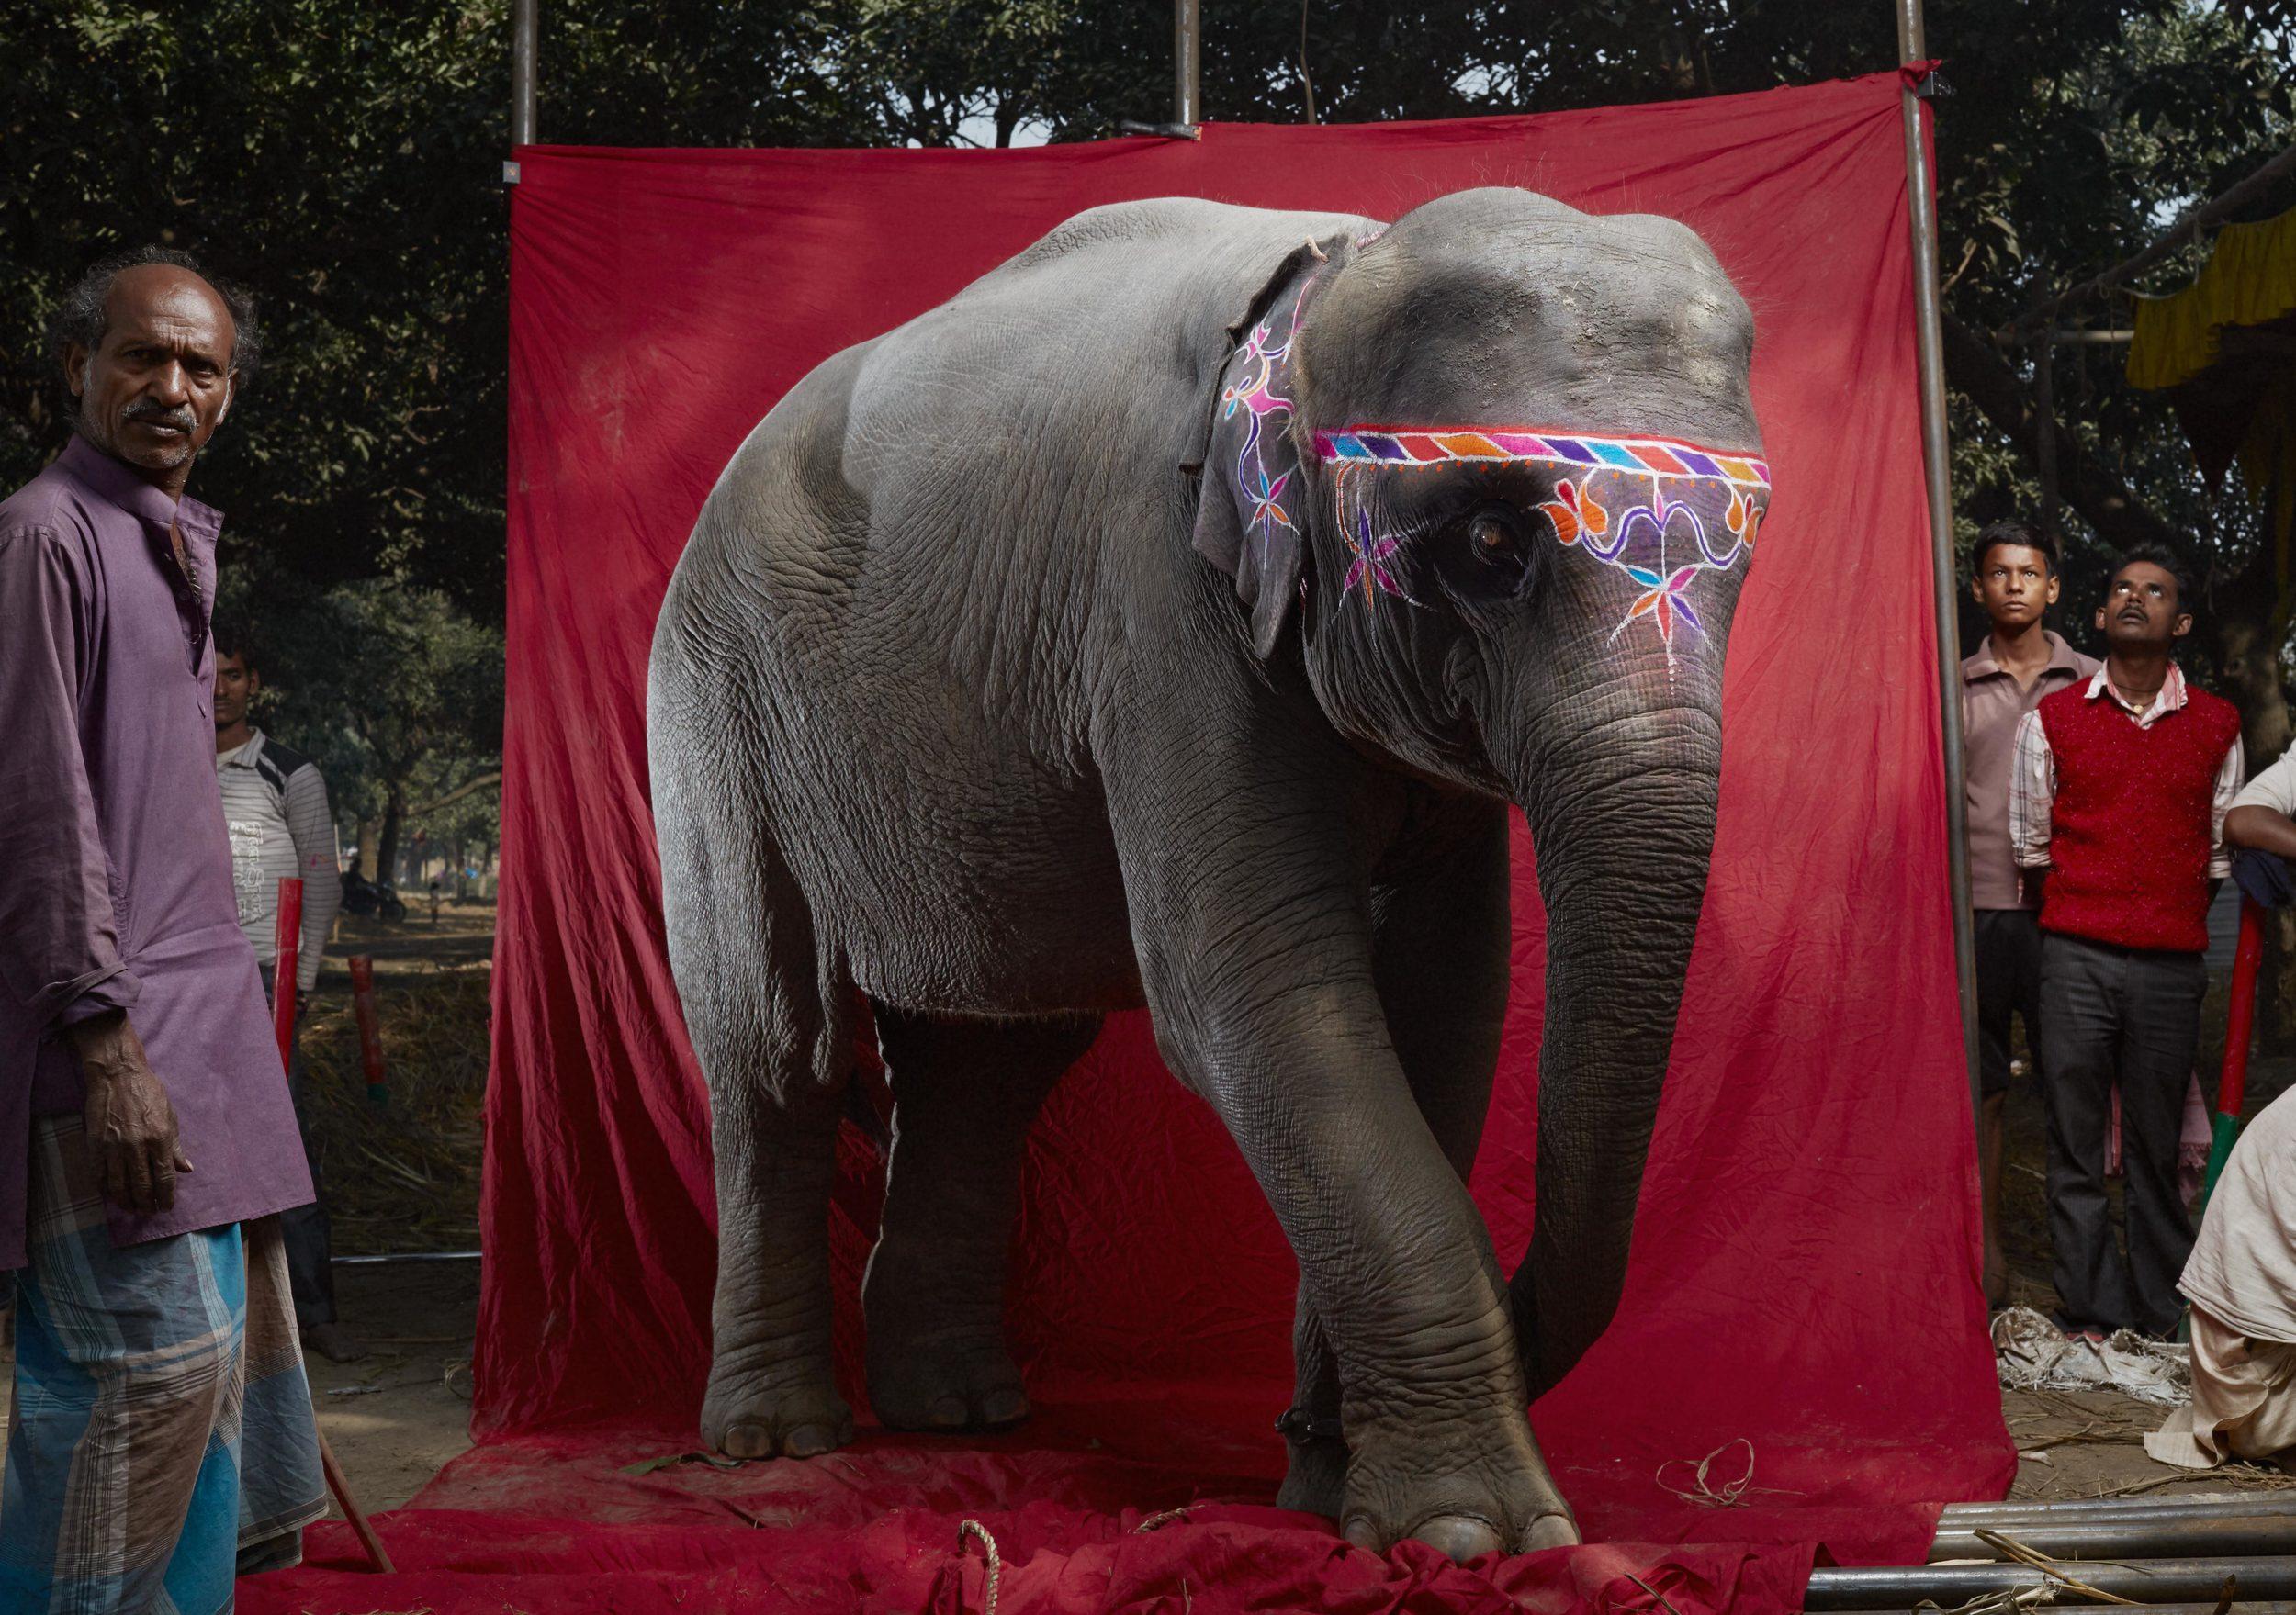 Elephant_5_1_B6C9957.jpg